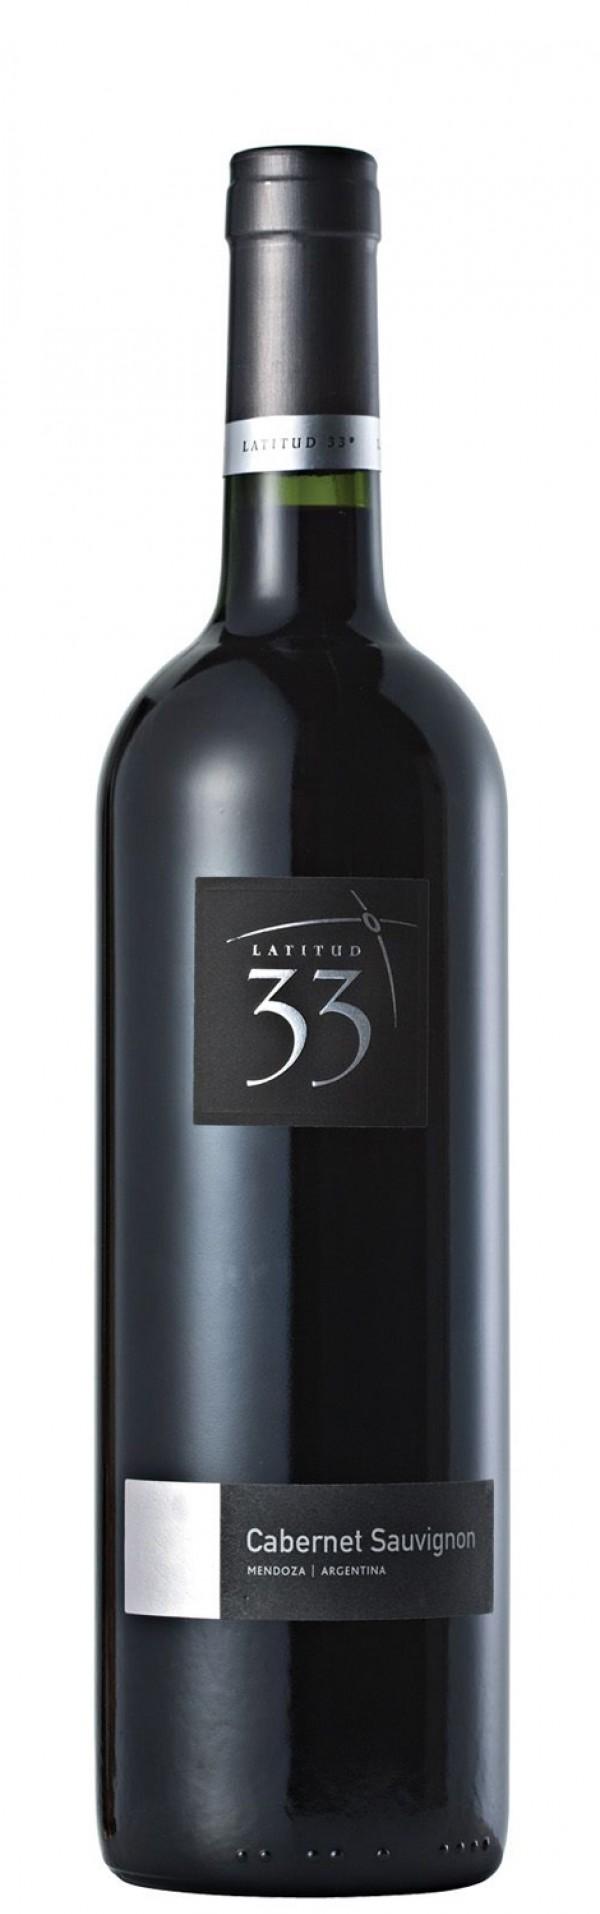 Vinho argentino Latitud 33° cabernet sauvignon 750 ml